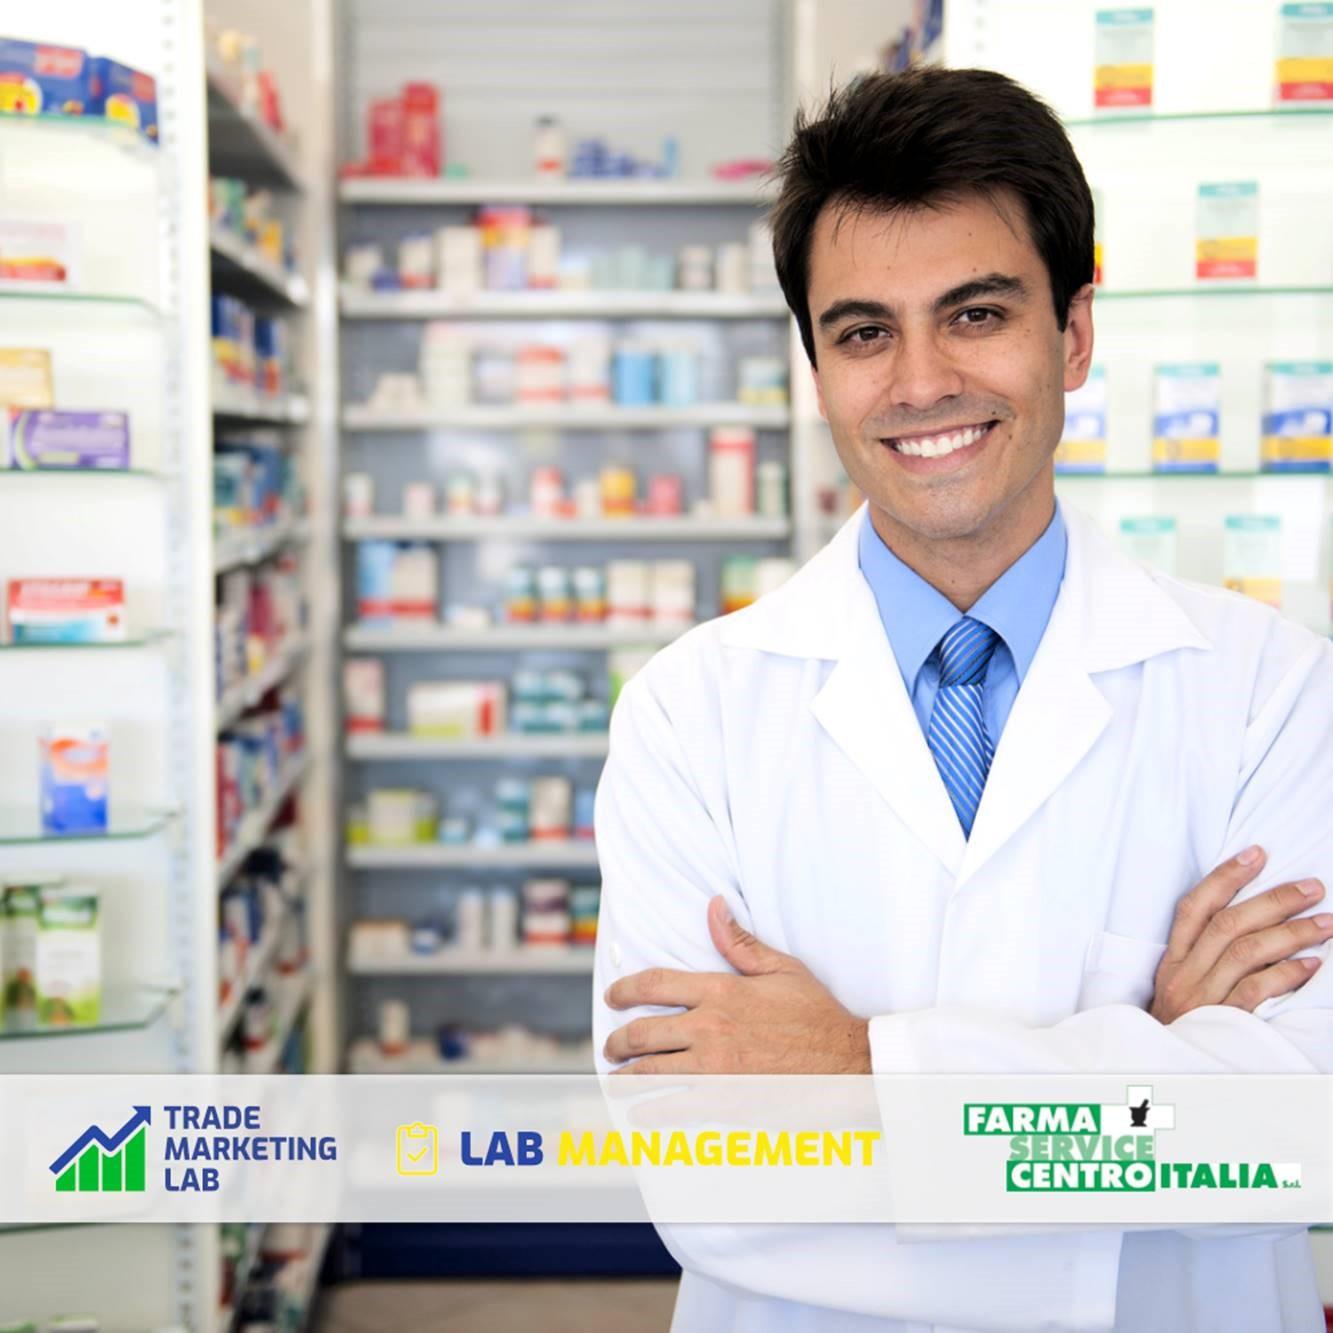 lab-management